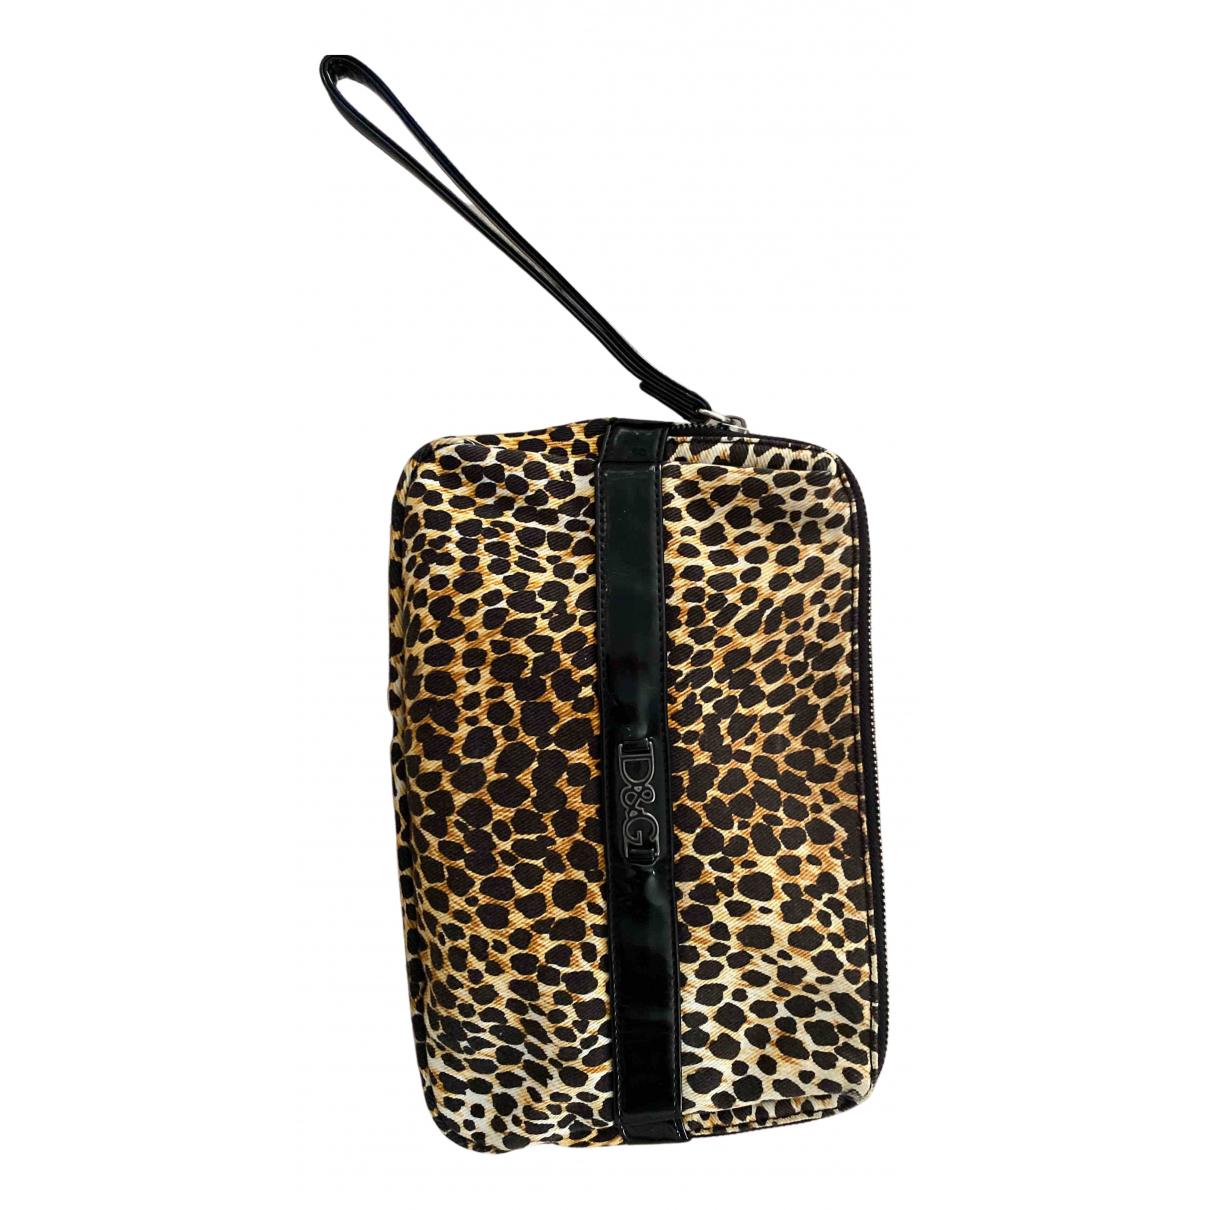 D&g N Multicolour Cotton Clutch bag for Women N